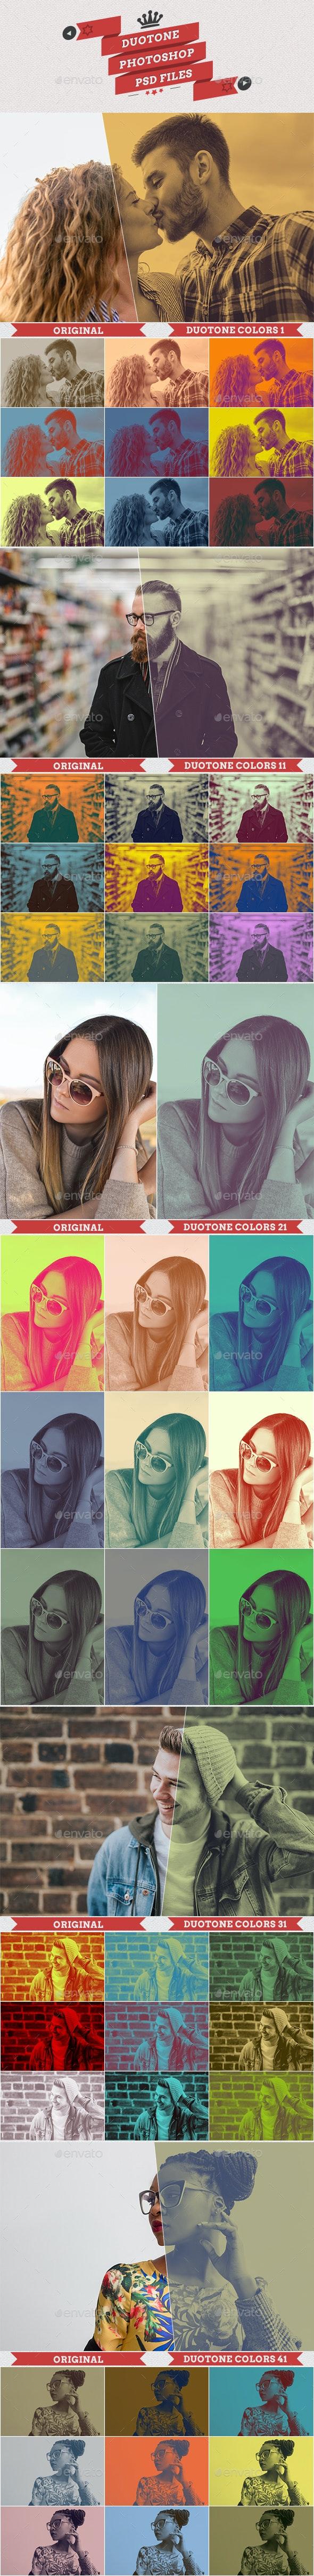 Duotone Colors PSD - Artistic Photo Templates